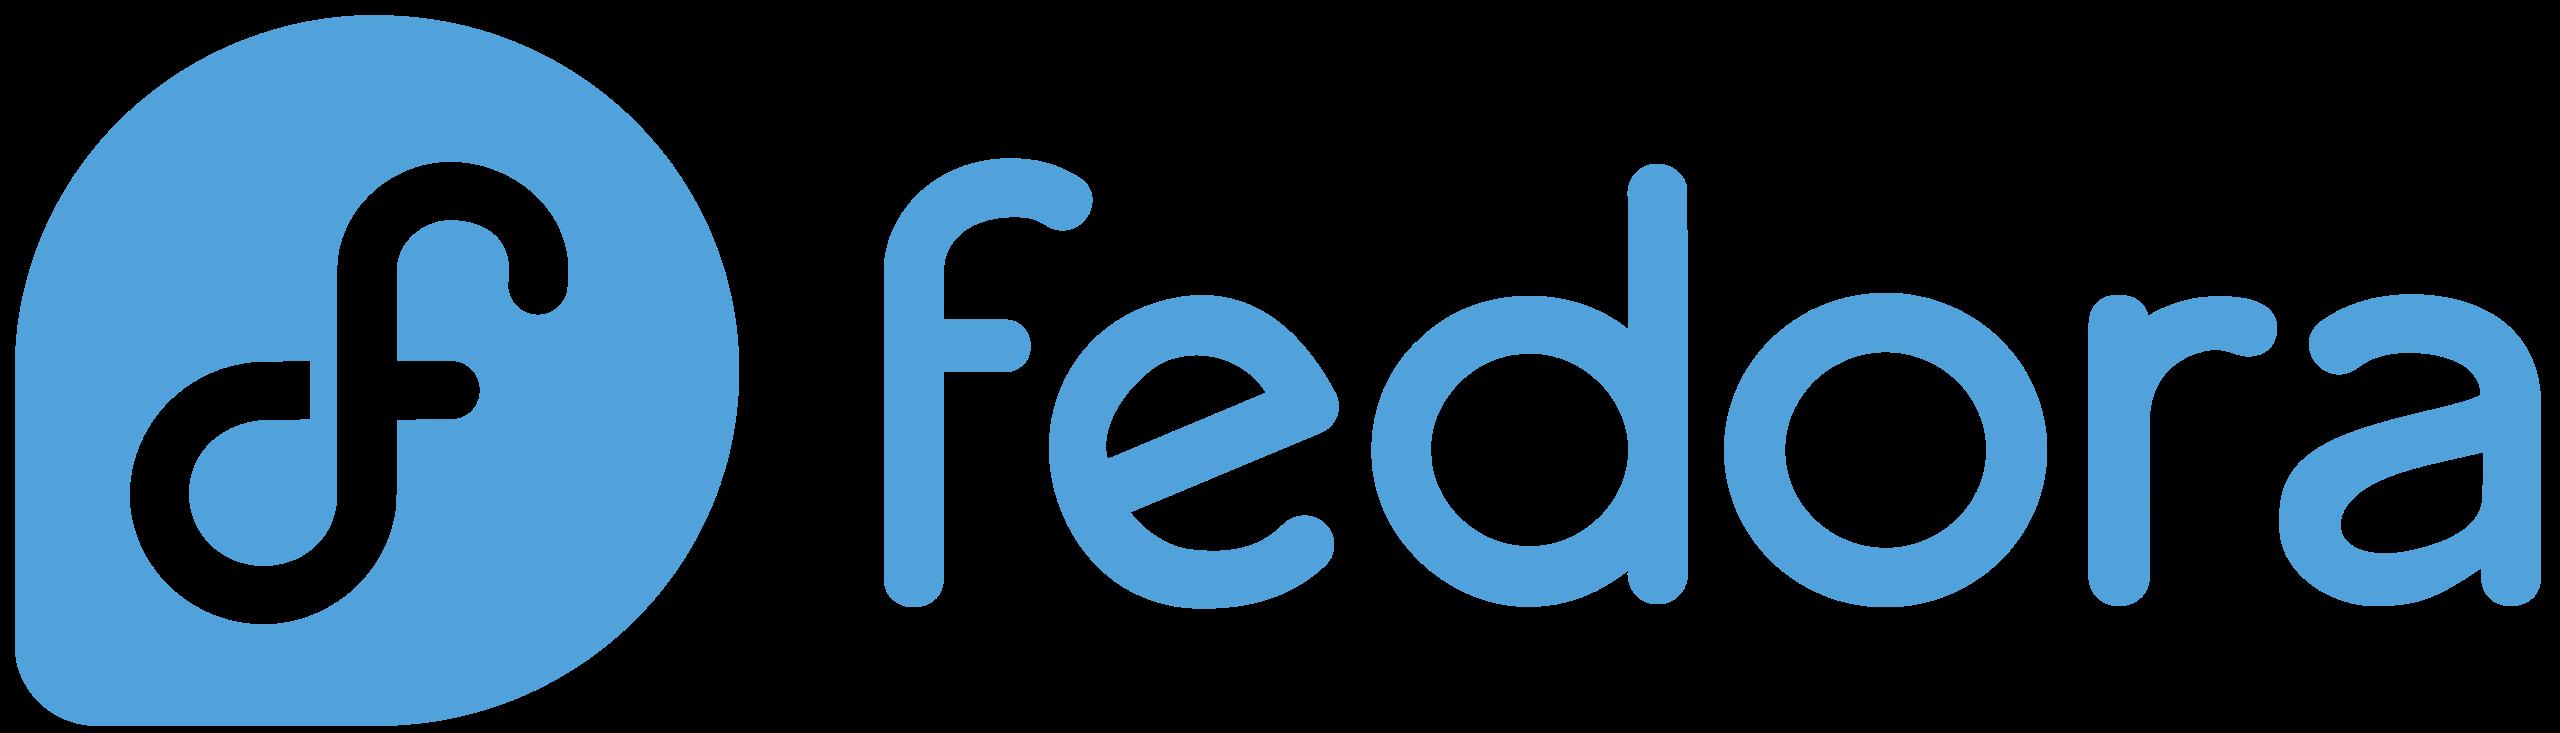 https://en.wikipedia.org/wiki/Fedora_(operating_system)#/media/File:Fedora_logo_(2021).svg